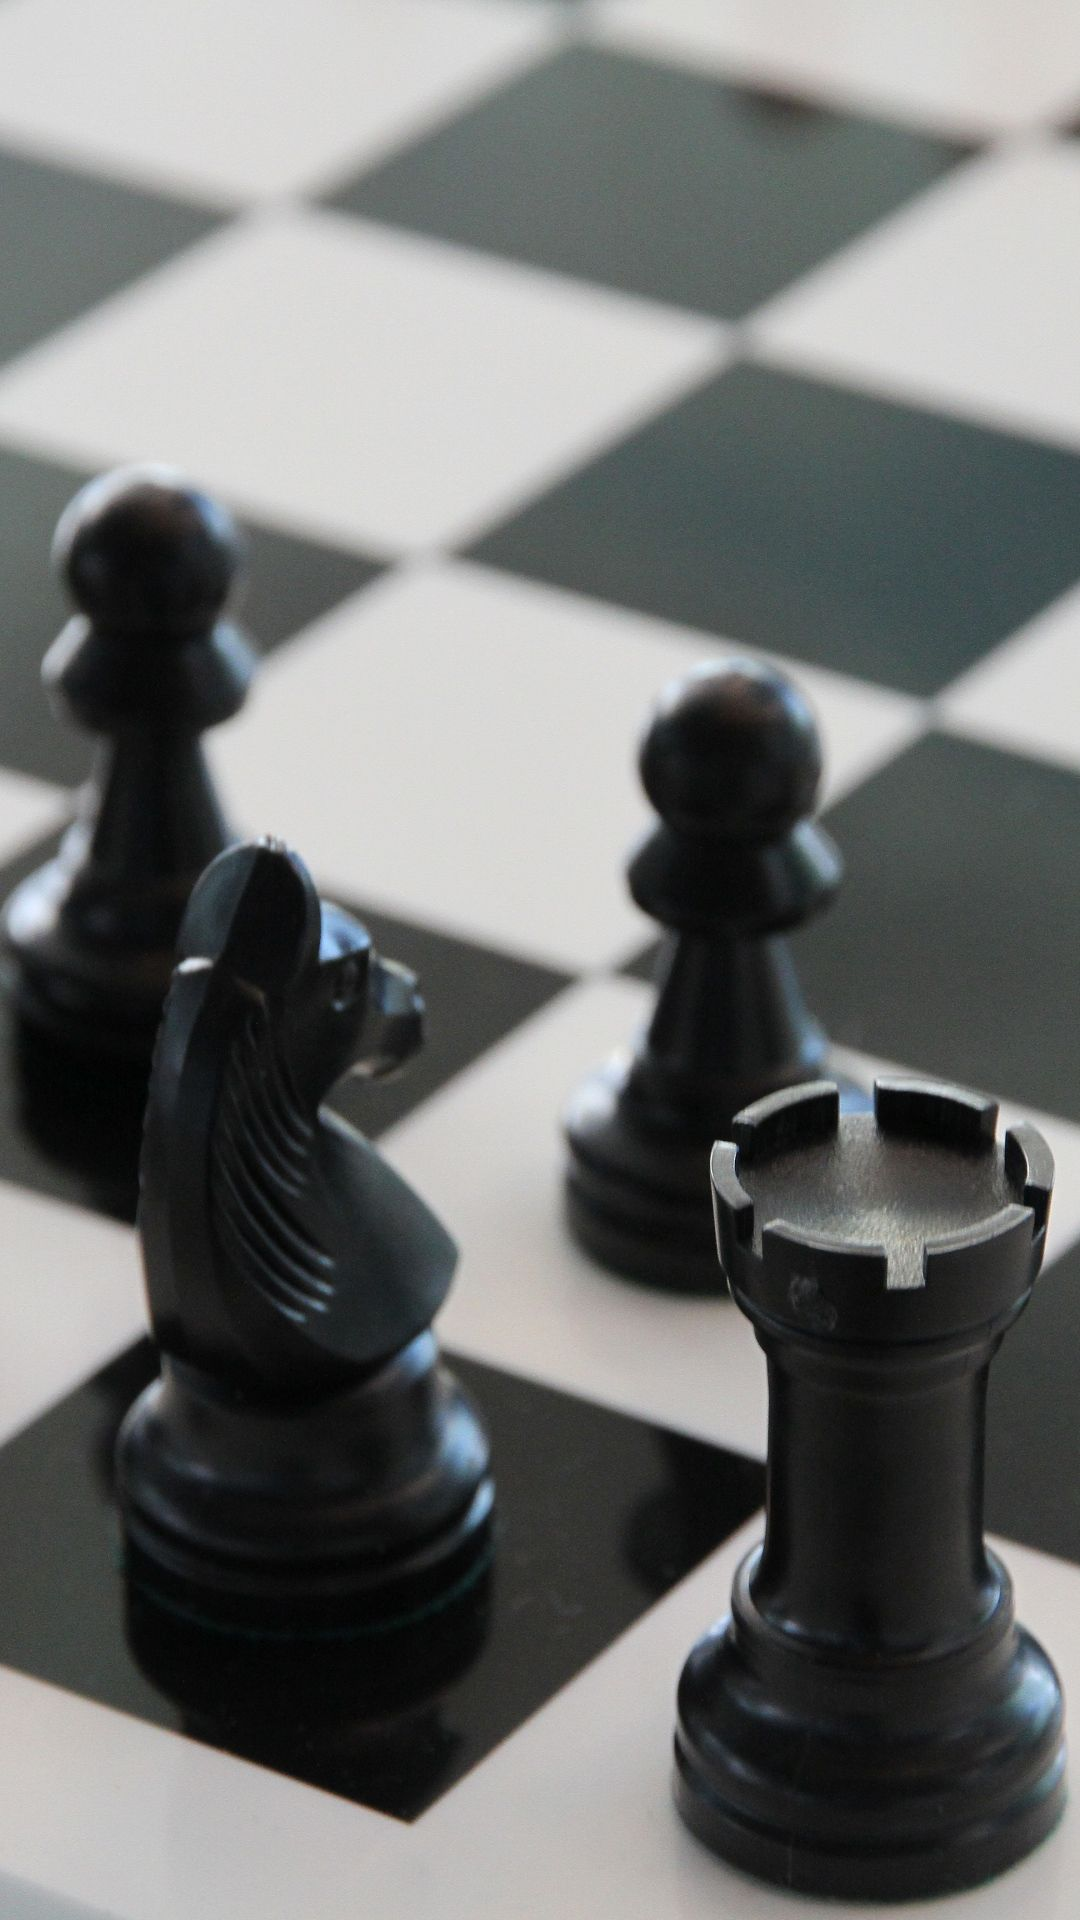 Download Wallpaper 1080x1920 Chess, Chessboard, Figure, Bw